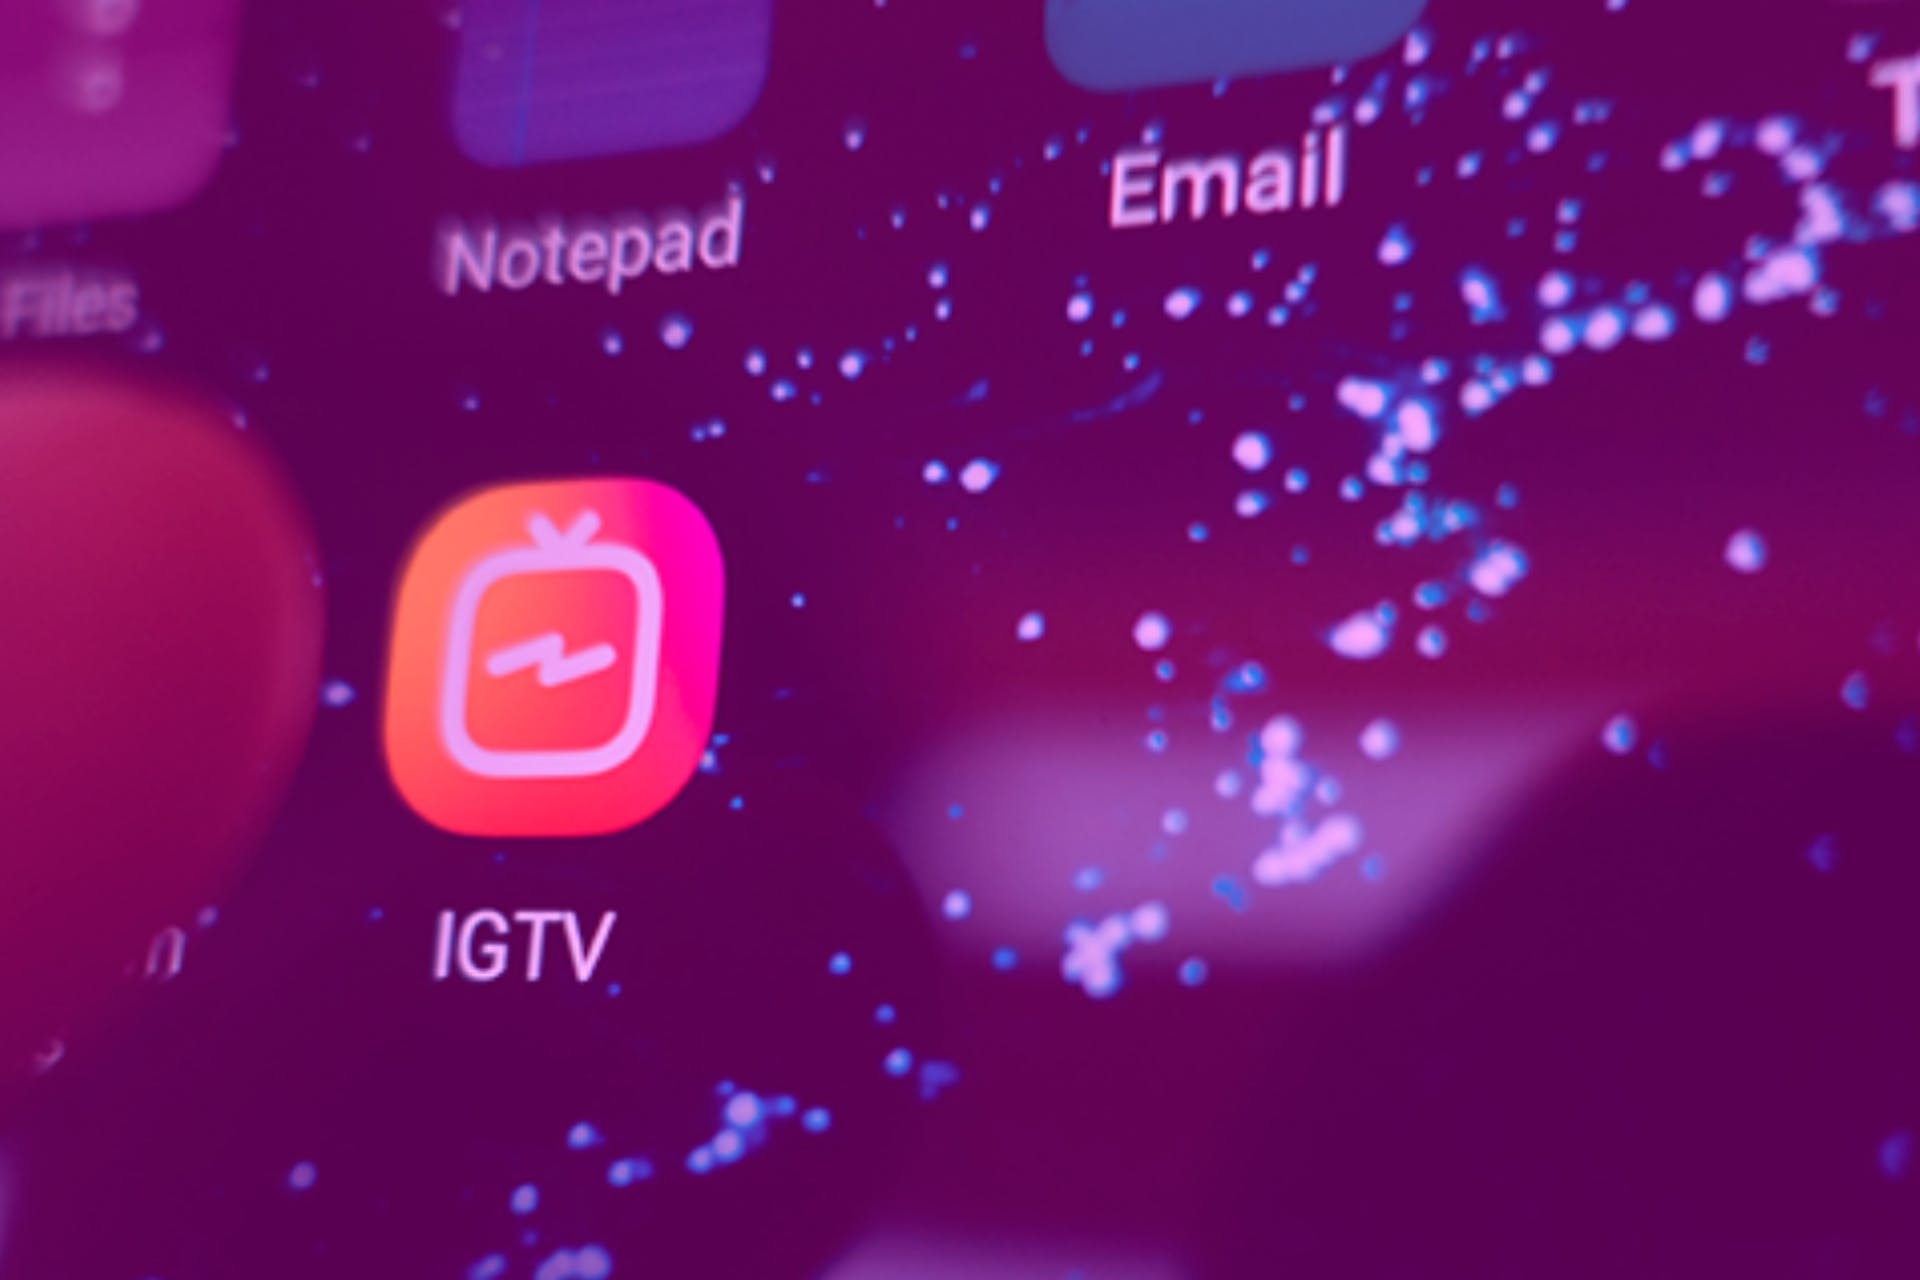 screenshot of the Instagram IGTV app icon